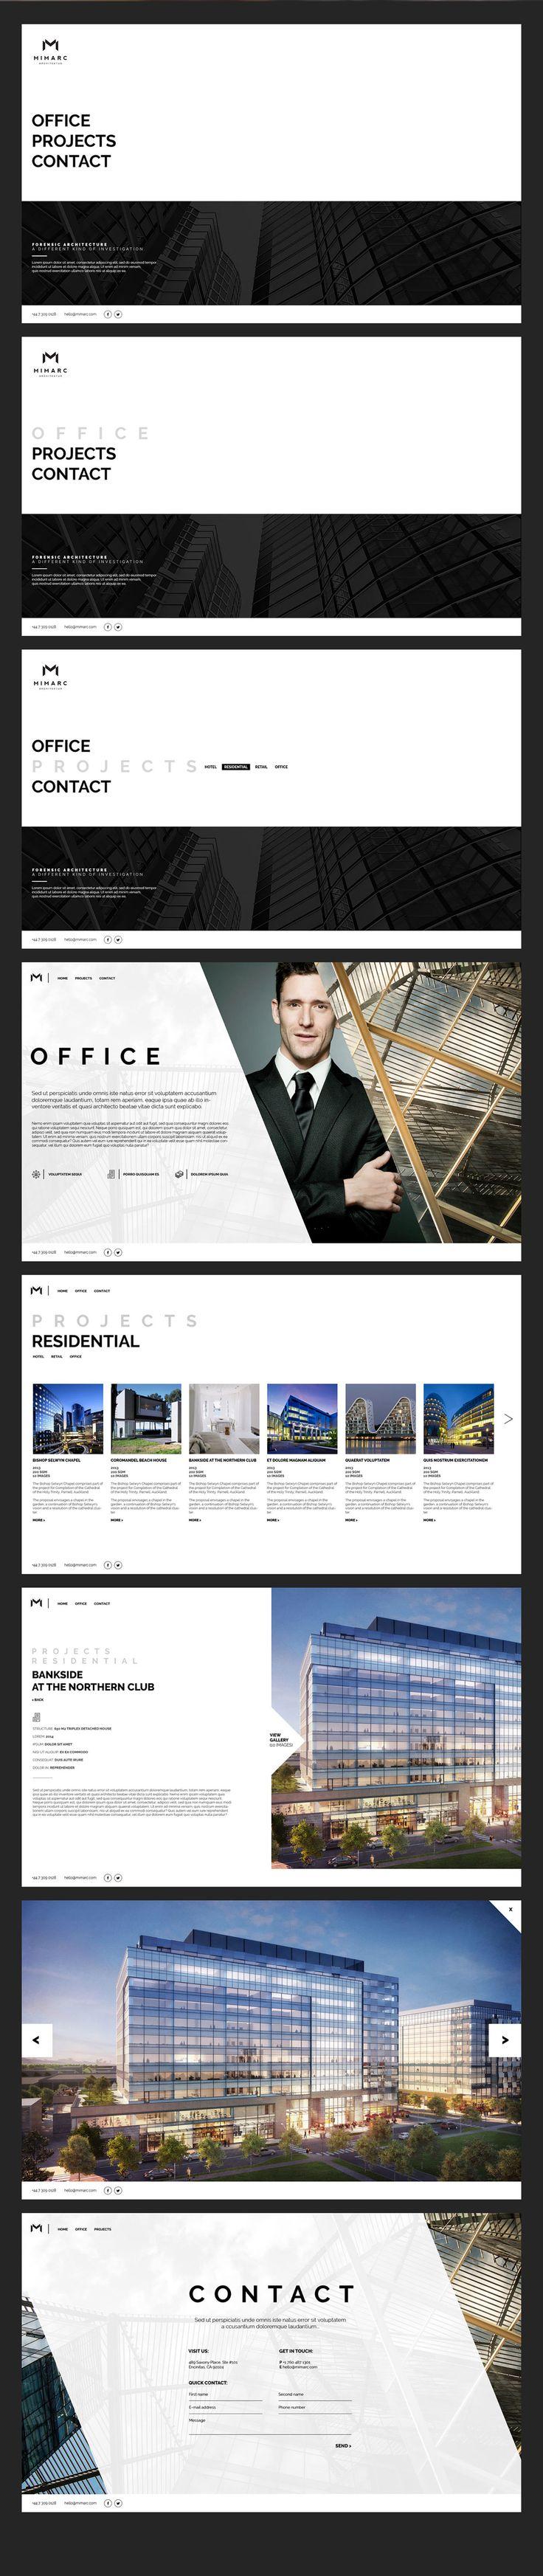 MIMARC - architects website on Behance